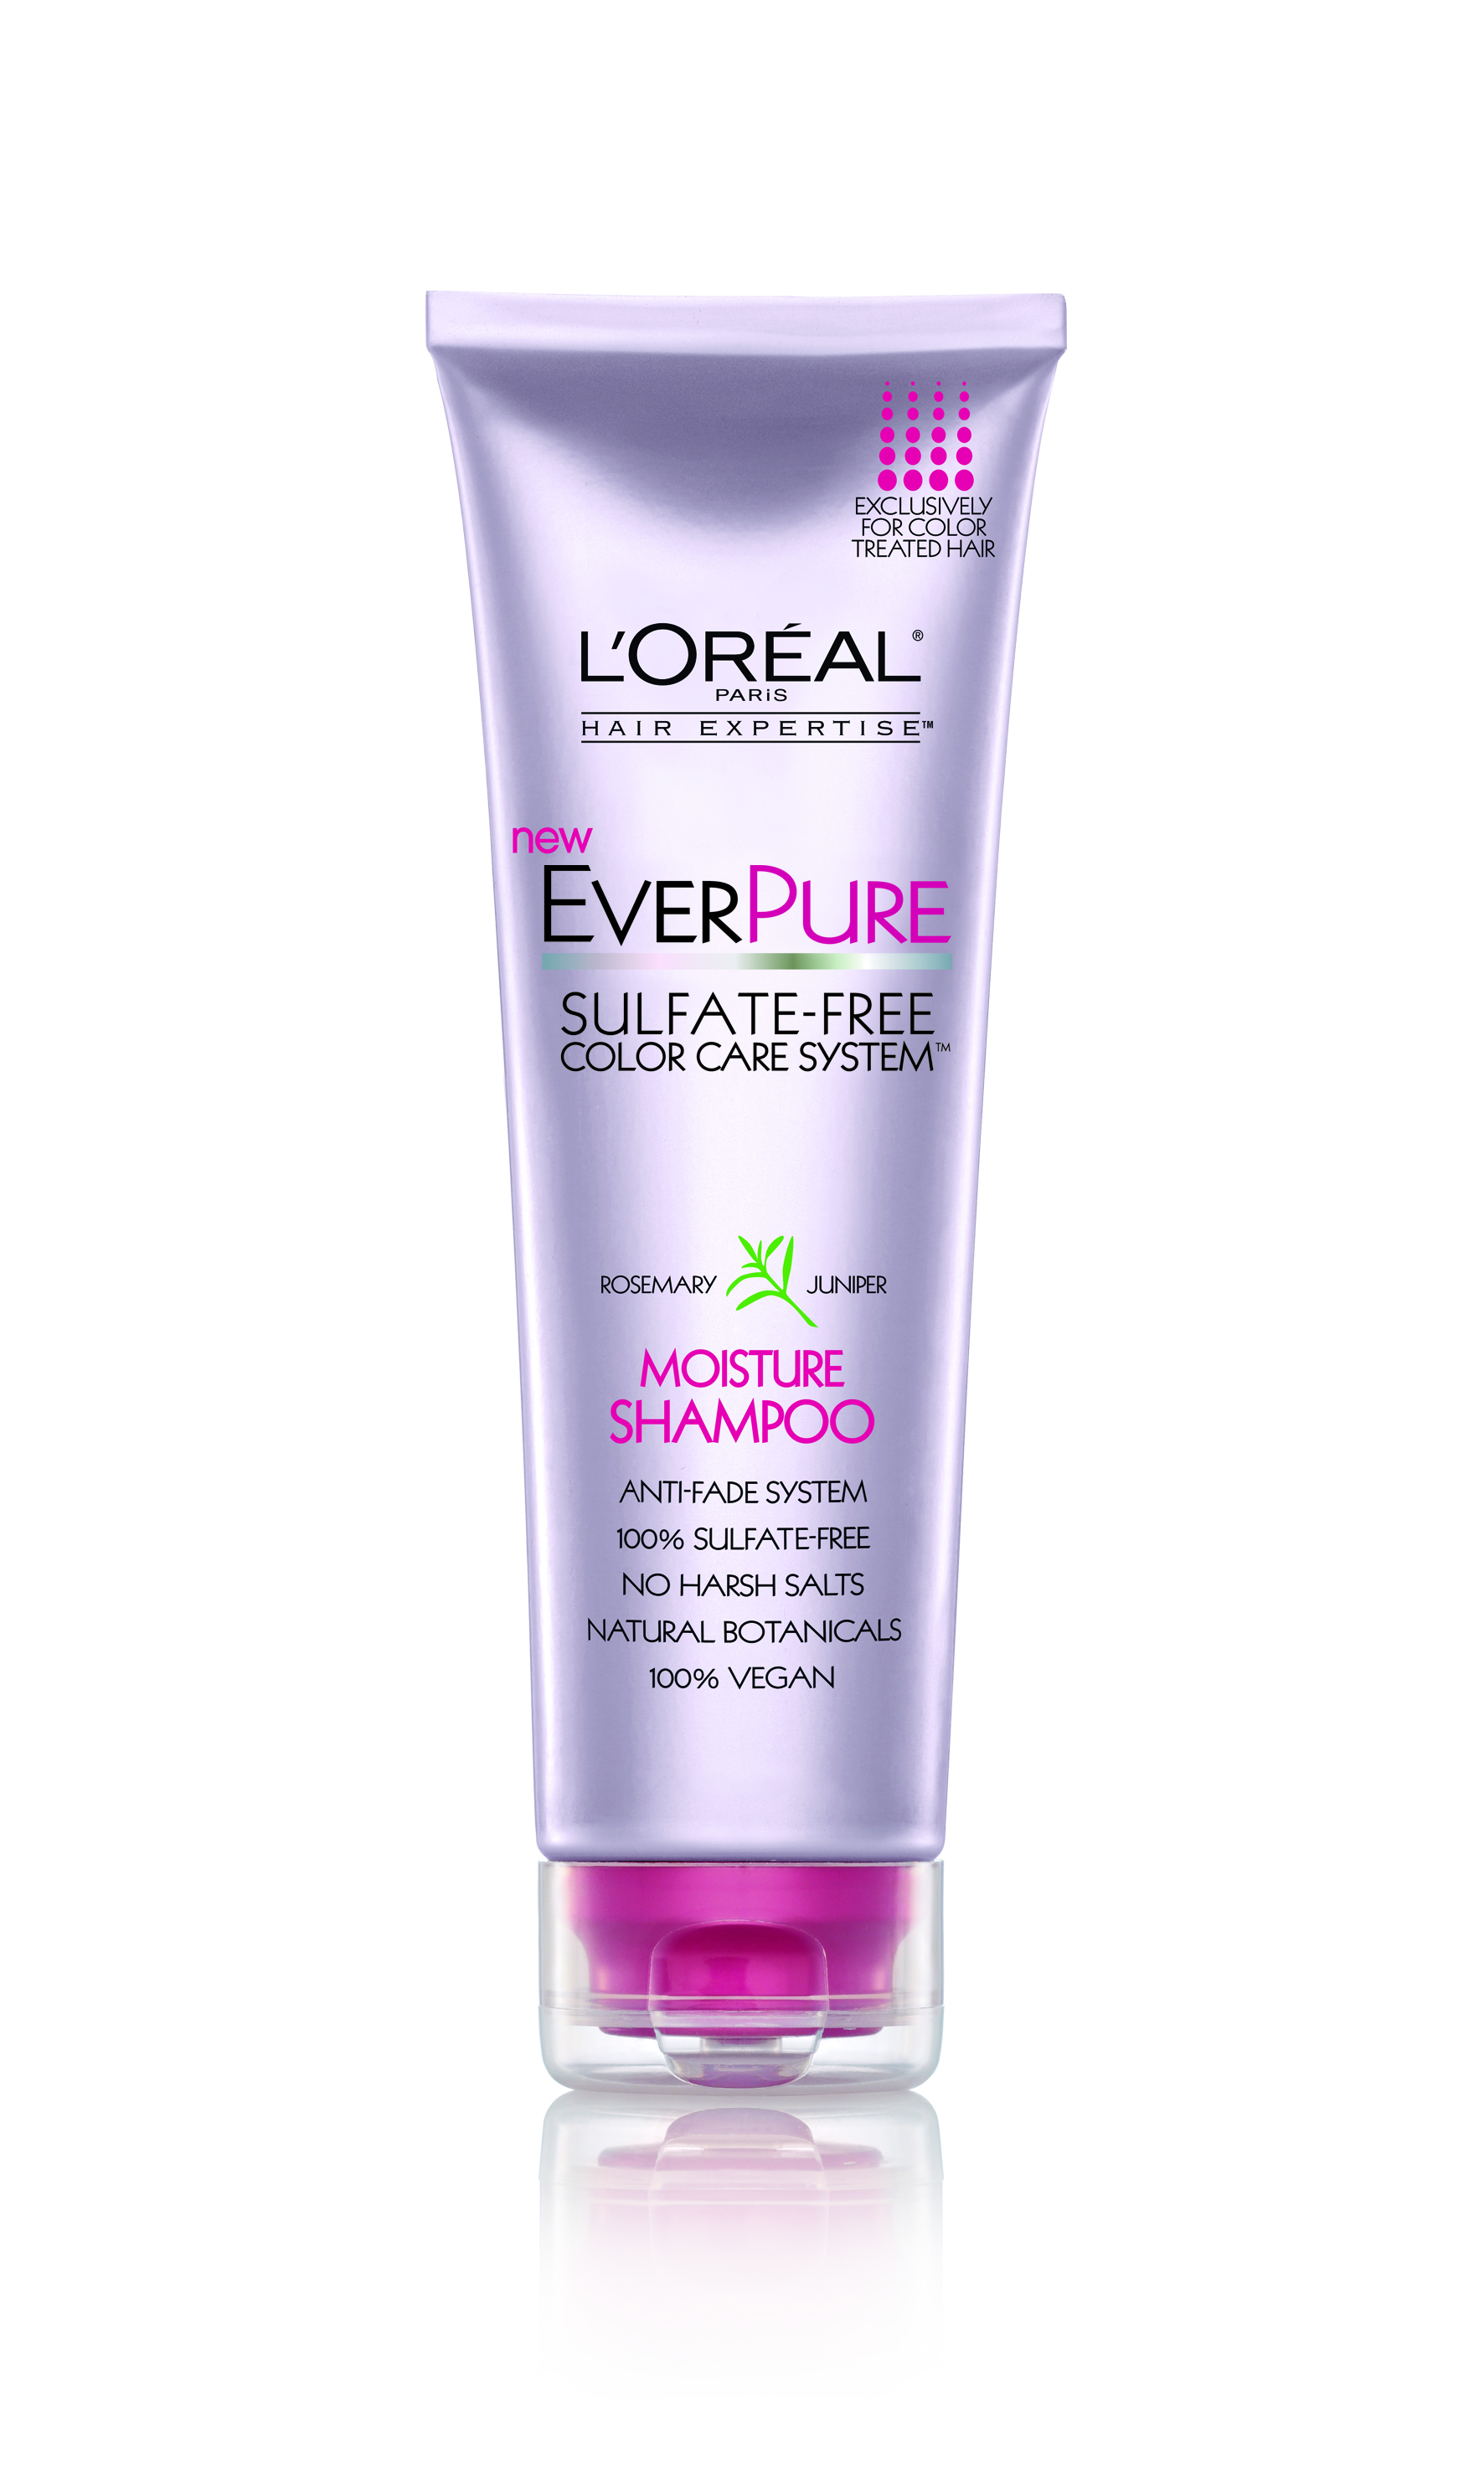 Loral Paris Hair Expertise Everpure Moisture Shampoo And